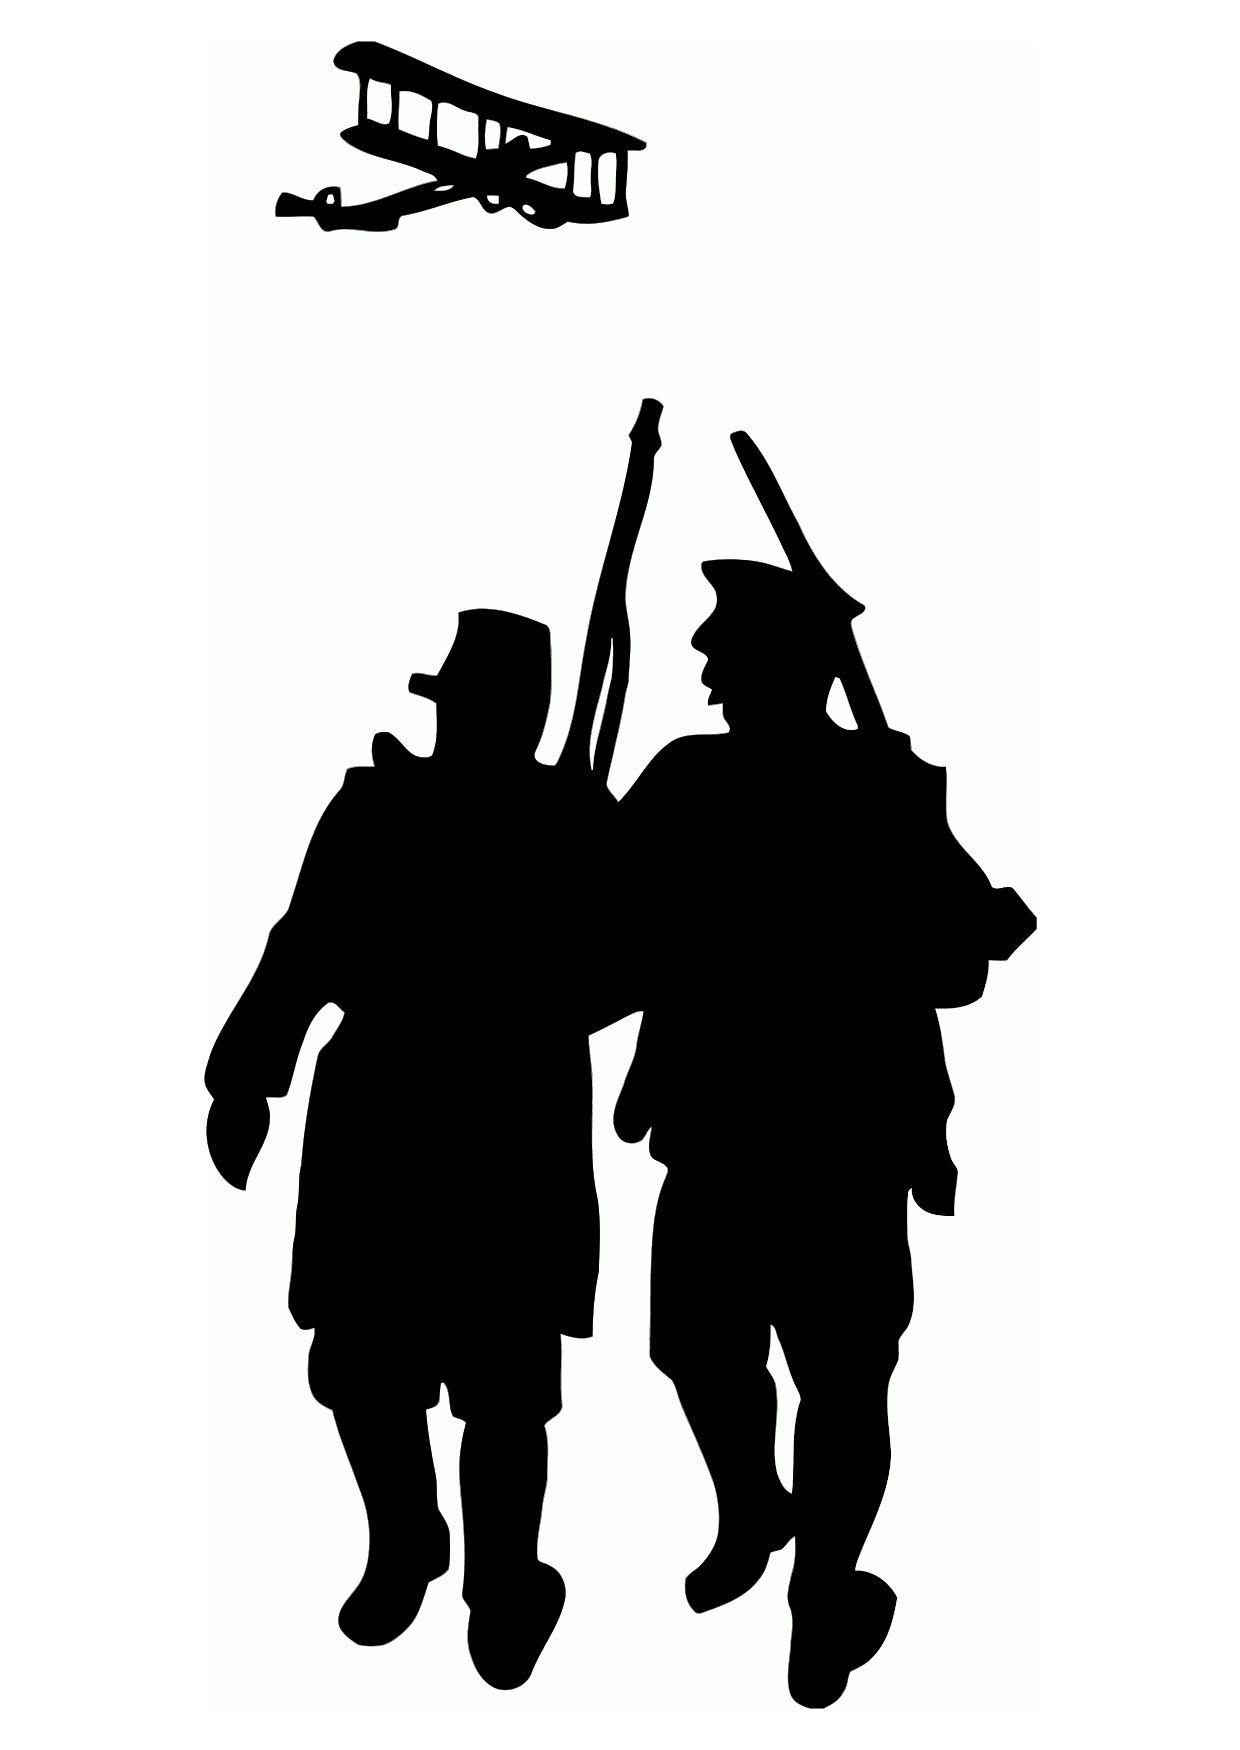 Dibujo para colorear Silueta de la primera guerra mundial